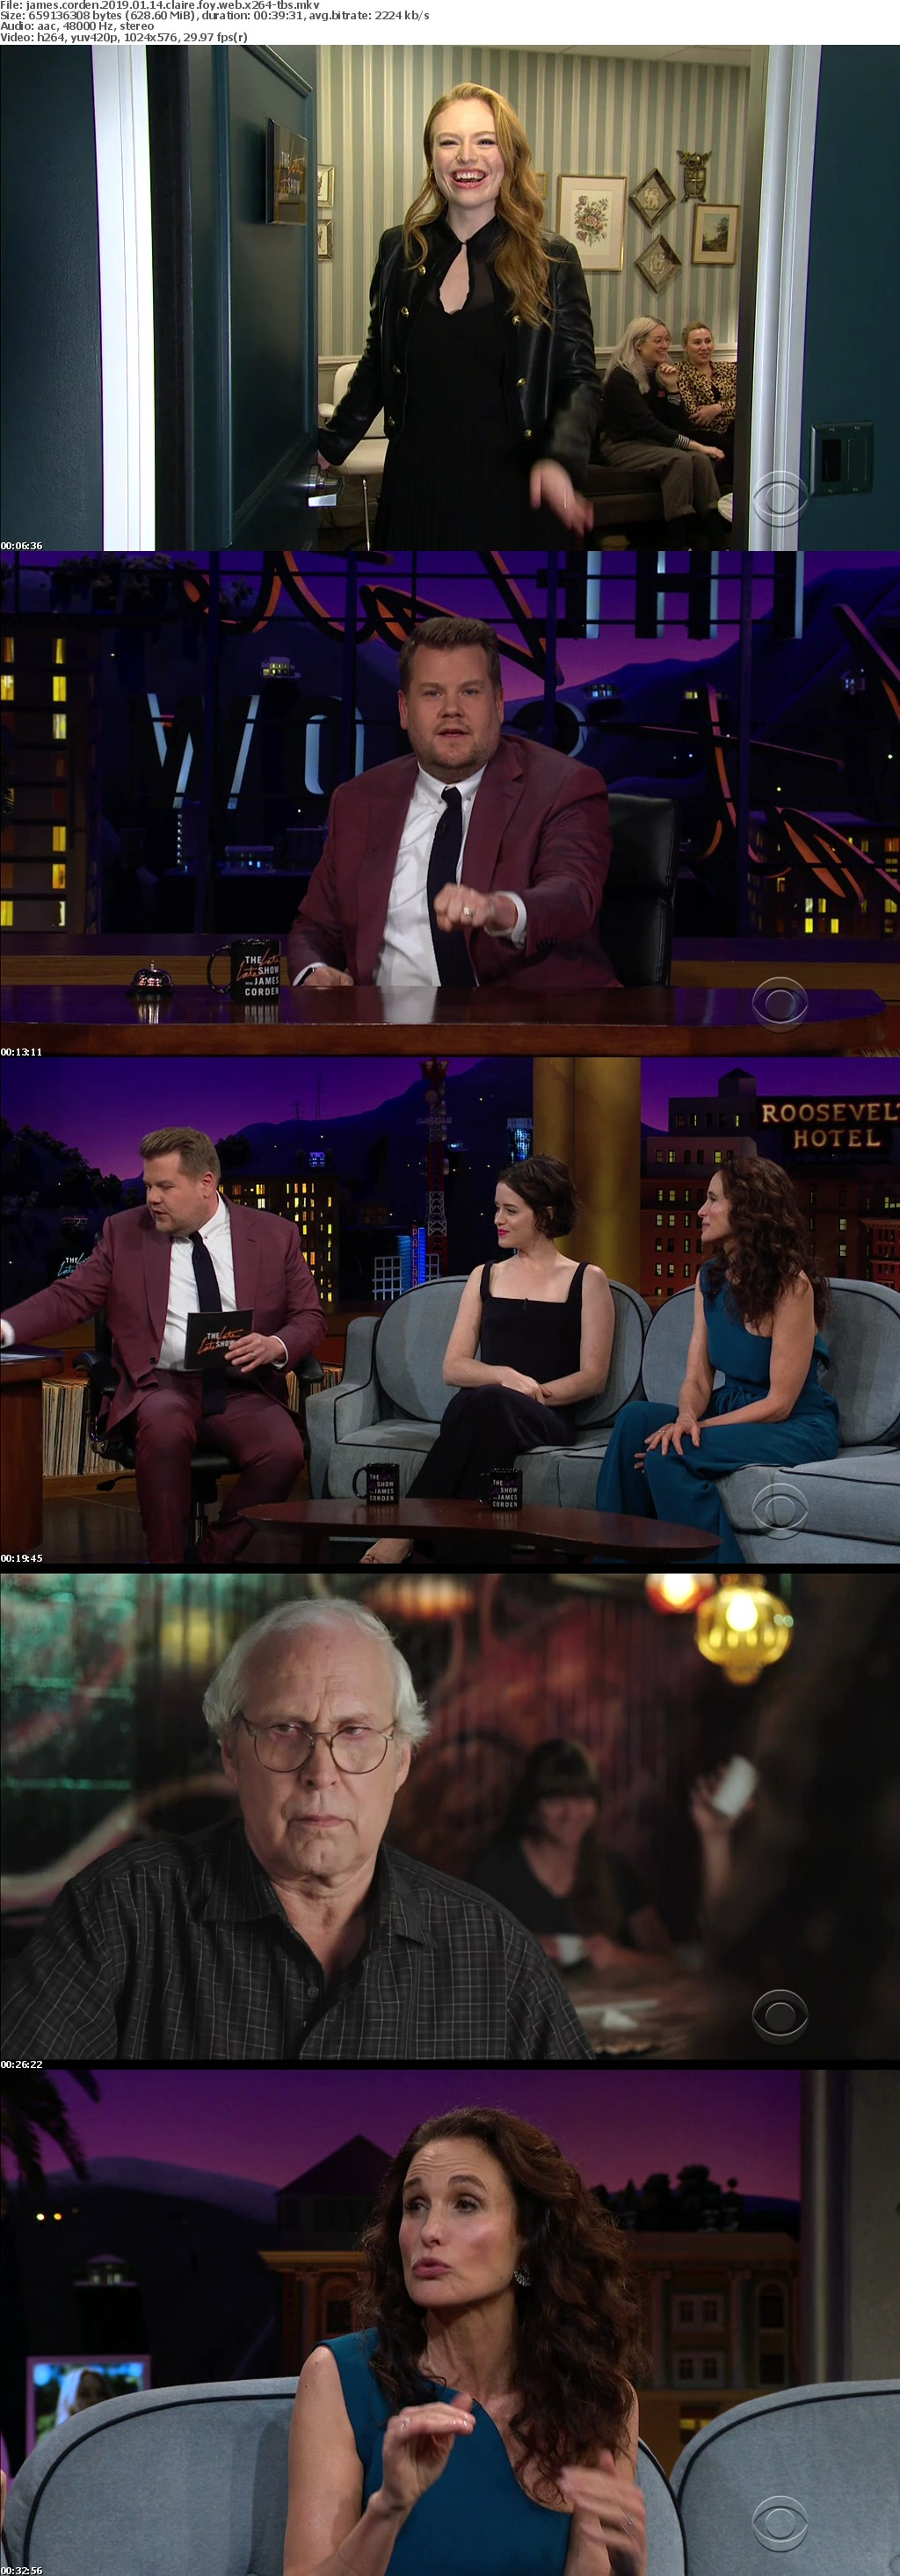 James Corden 2019 01 14 Claire Foy WEB x264-TBS